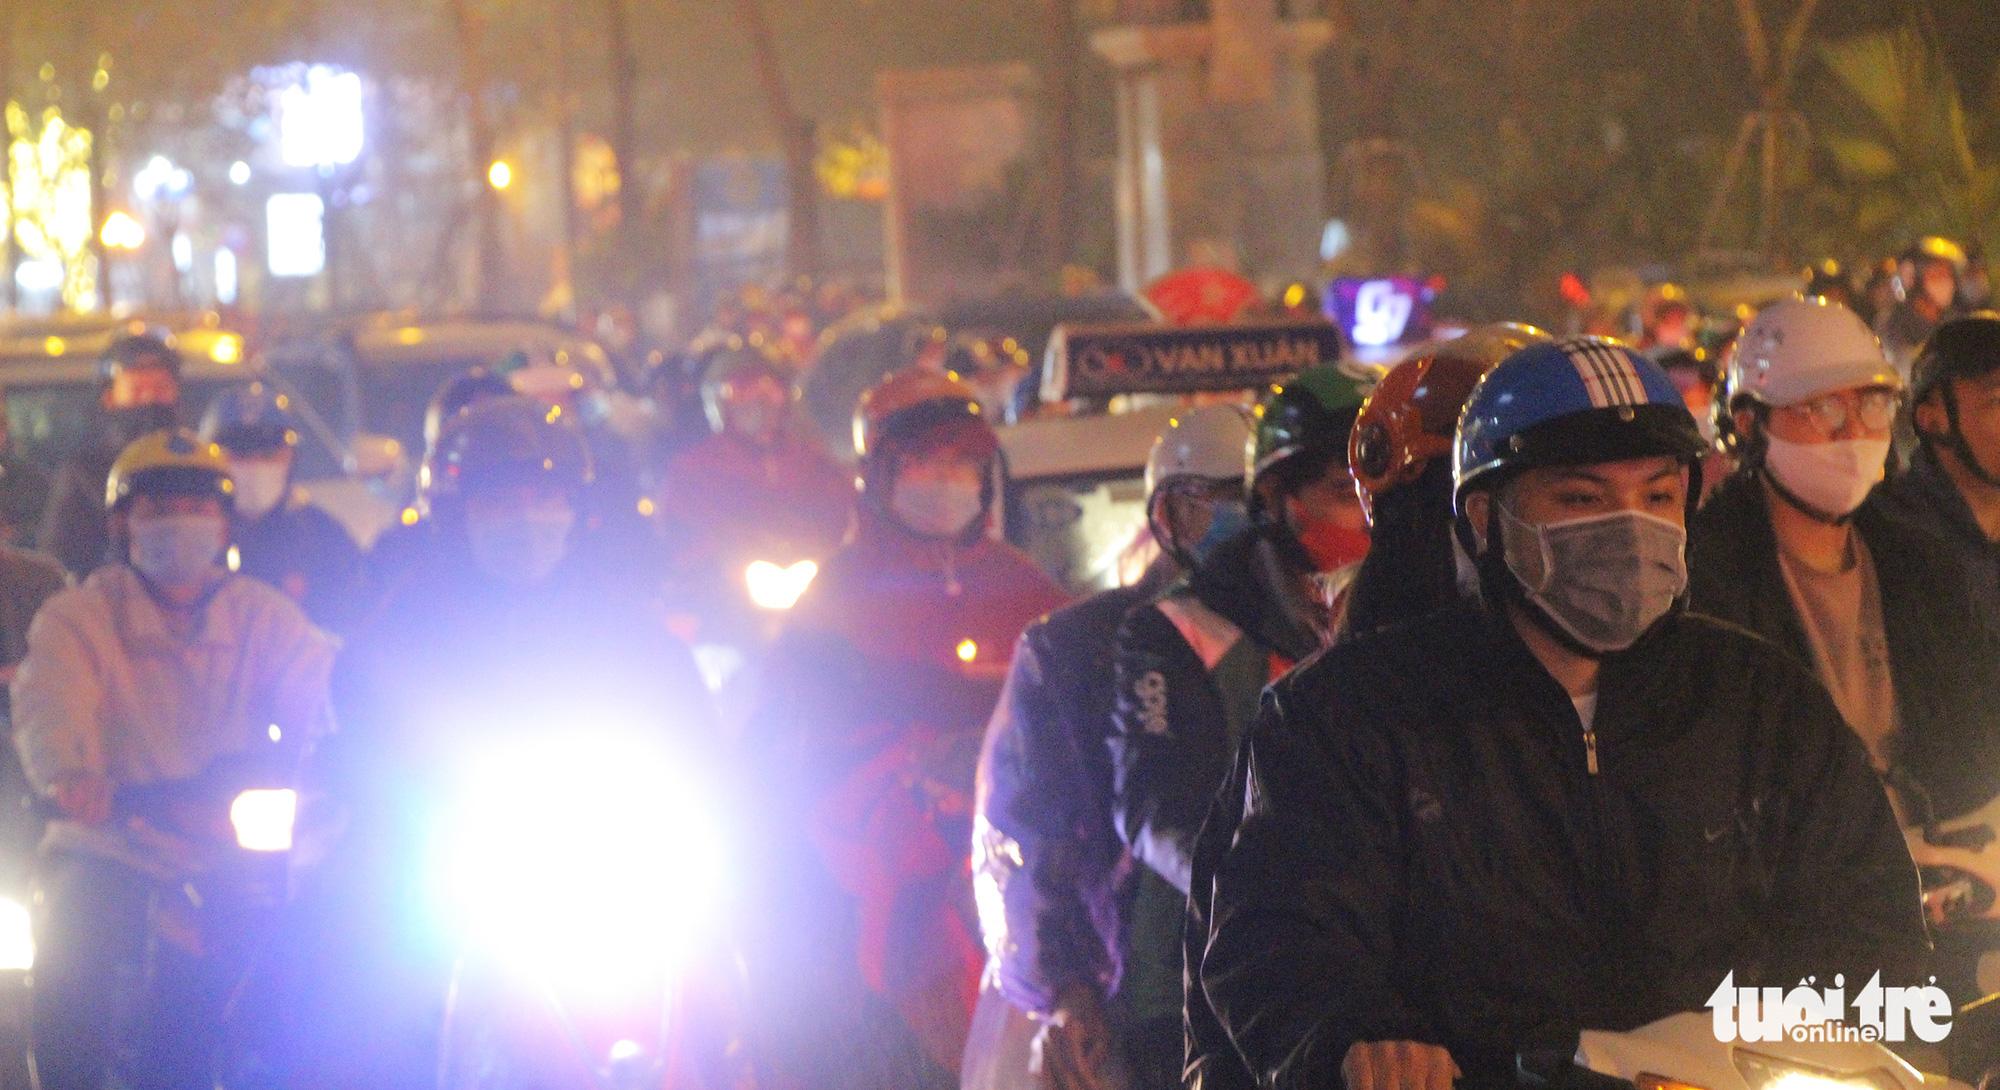 Traffic jammed as Hanoi people end working week in drizzle